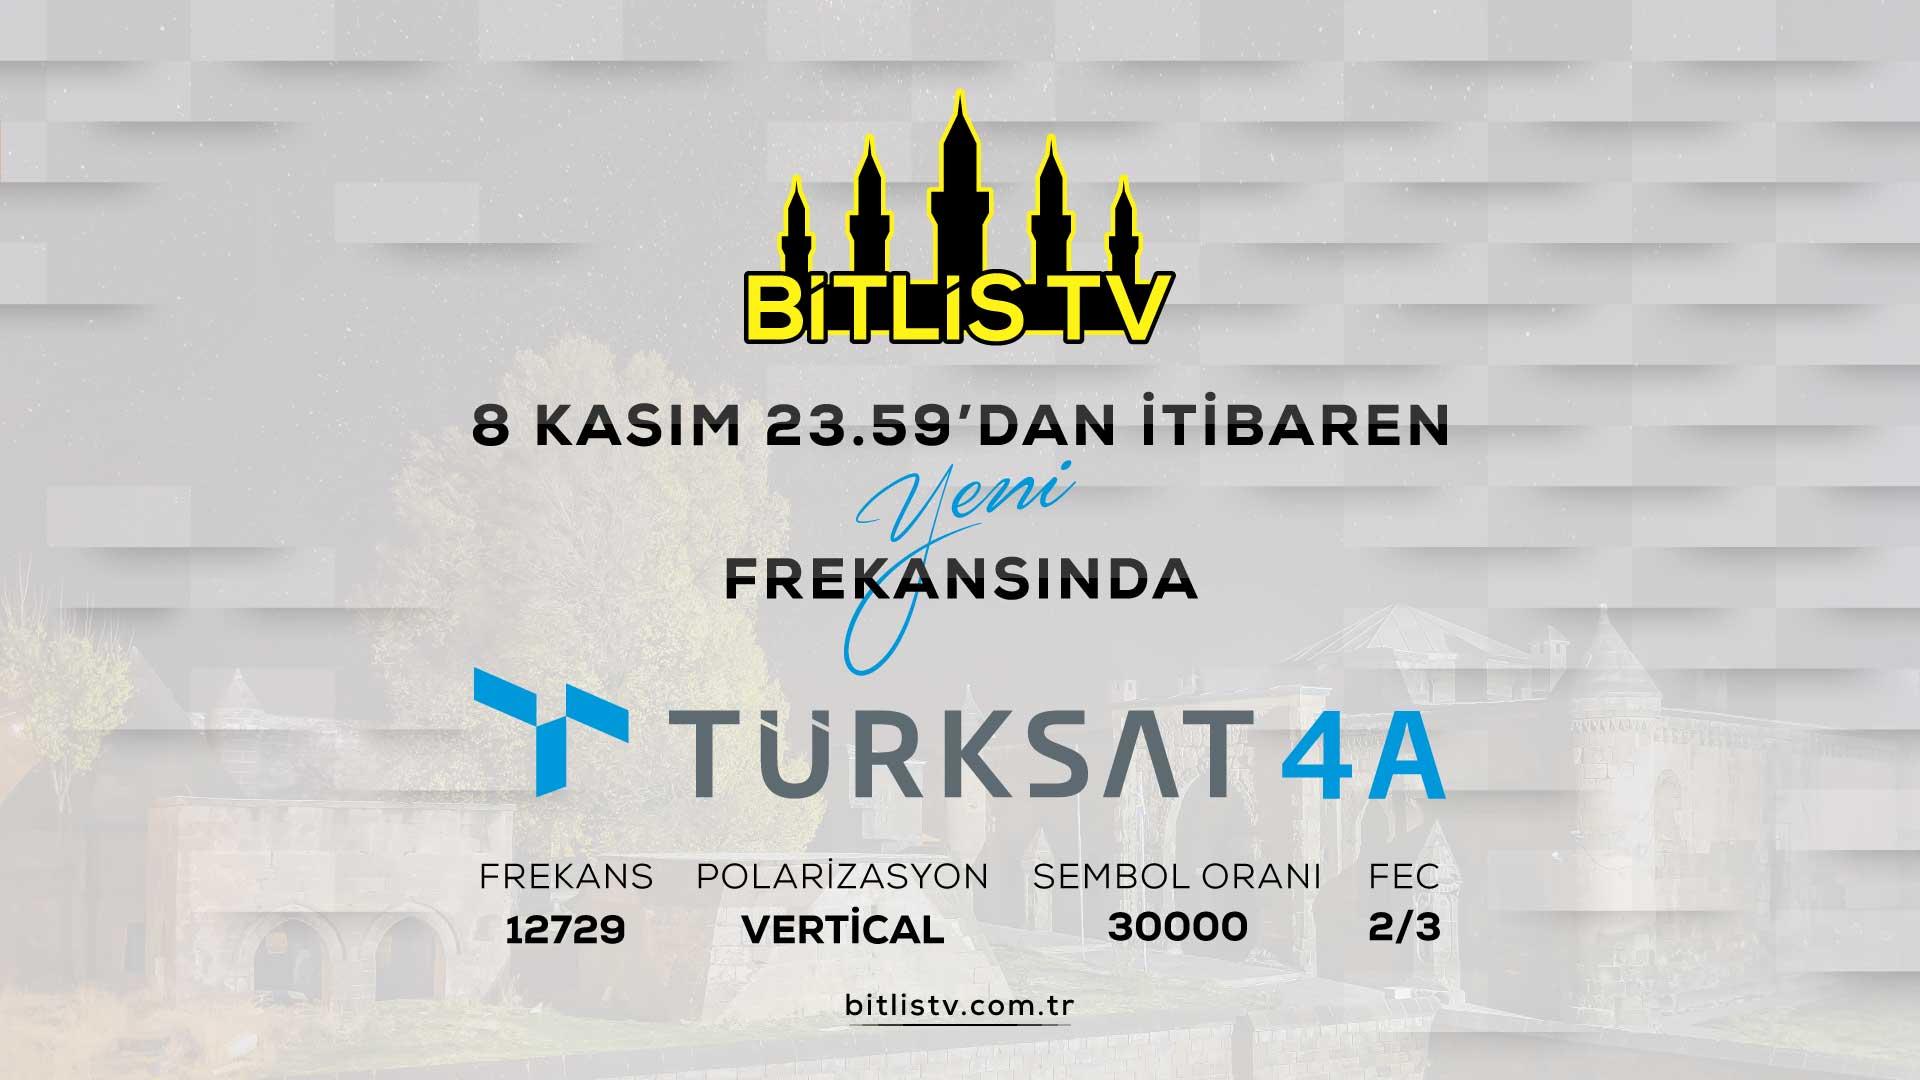 Bitlis TV Frekans Bilgileri